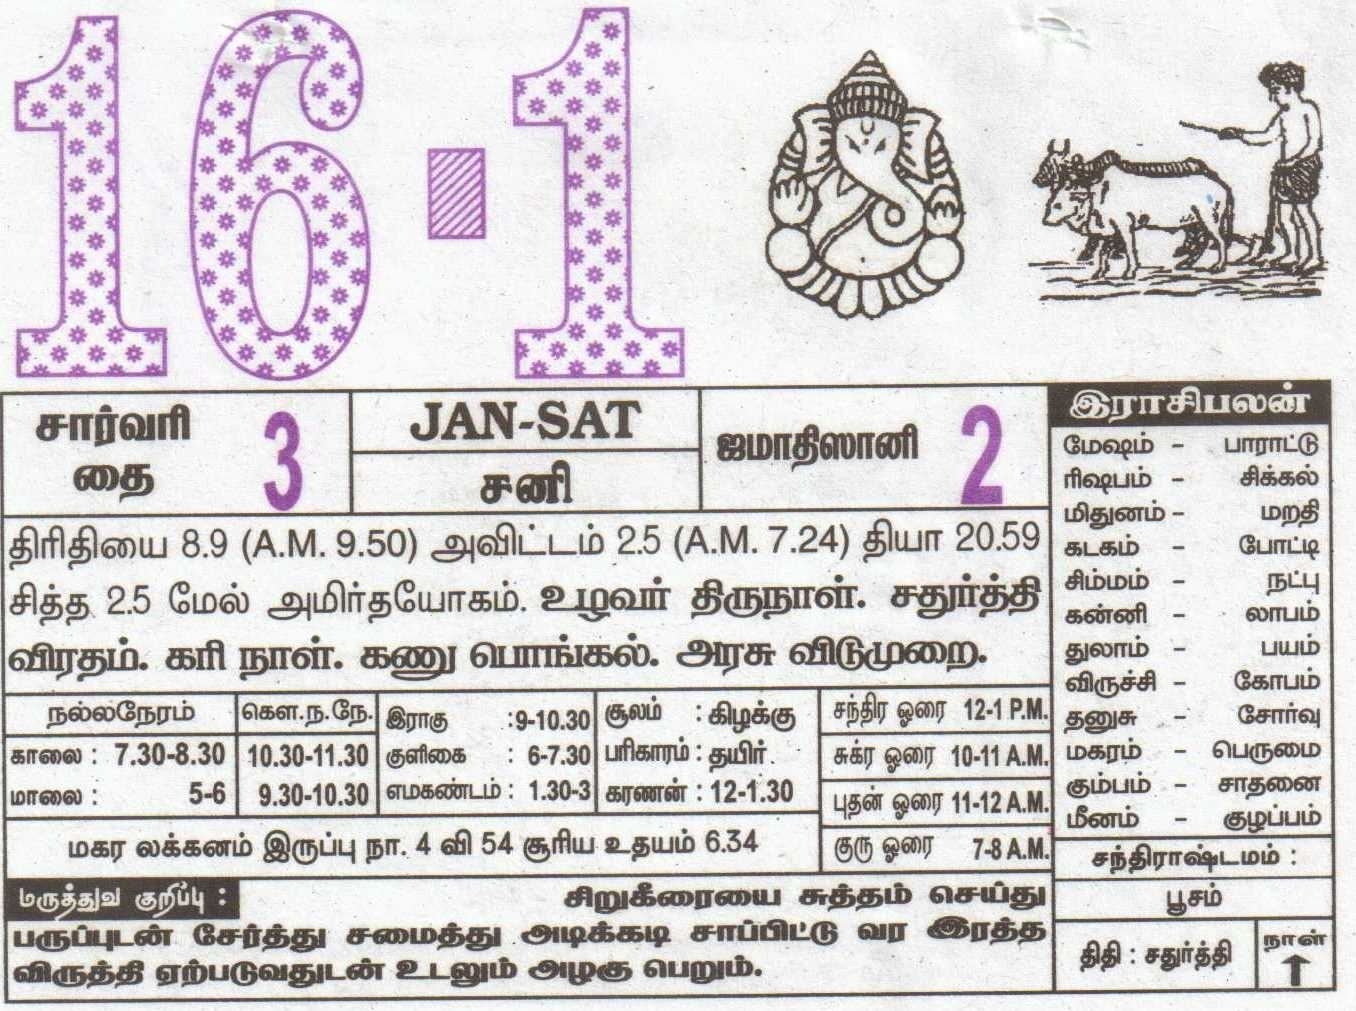 16-01-2021 Daily Calendar | Date 16 , January Daily Tear Off Calendar | Daily Panchangam Rasi Palan Marriage Dates In November 2021 Hindu Calendar